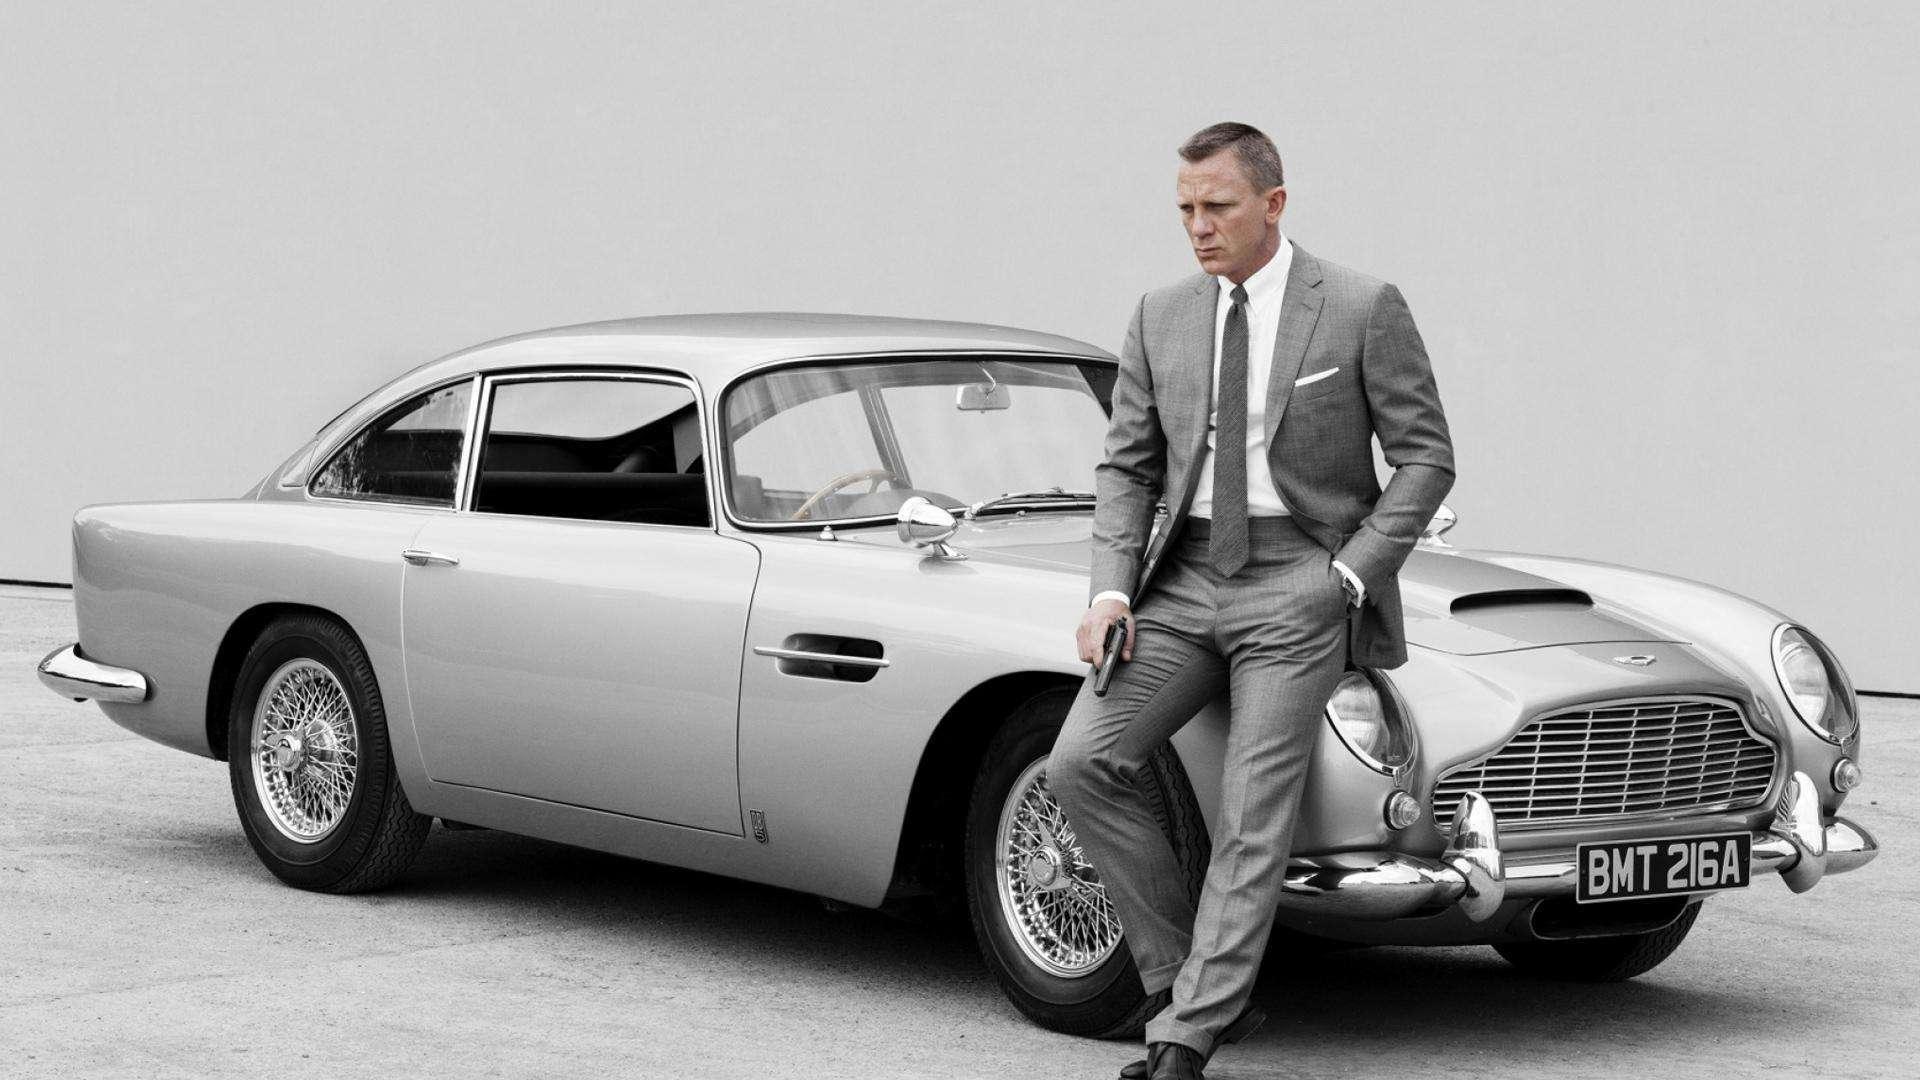 Wallpaper James Bond Wallpaper 1080p Upload at November 15 2015 by 1920x1080